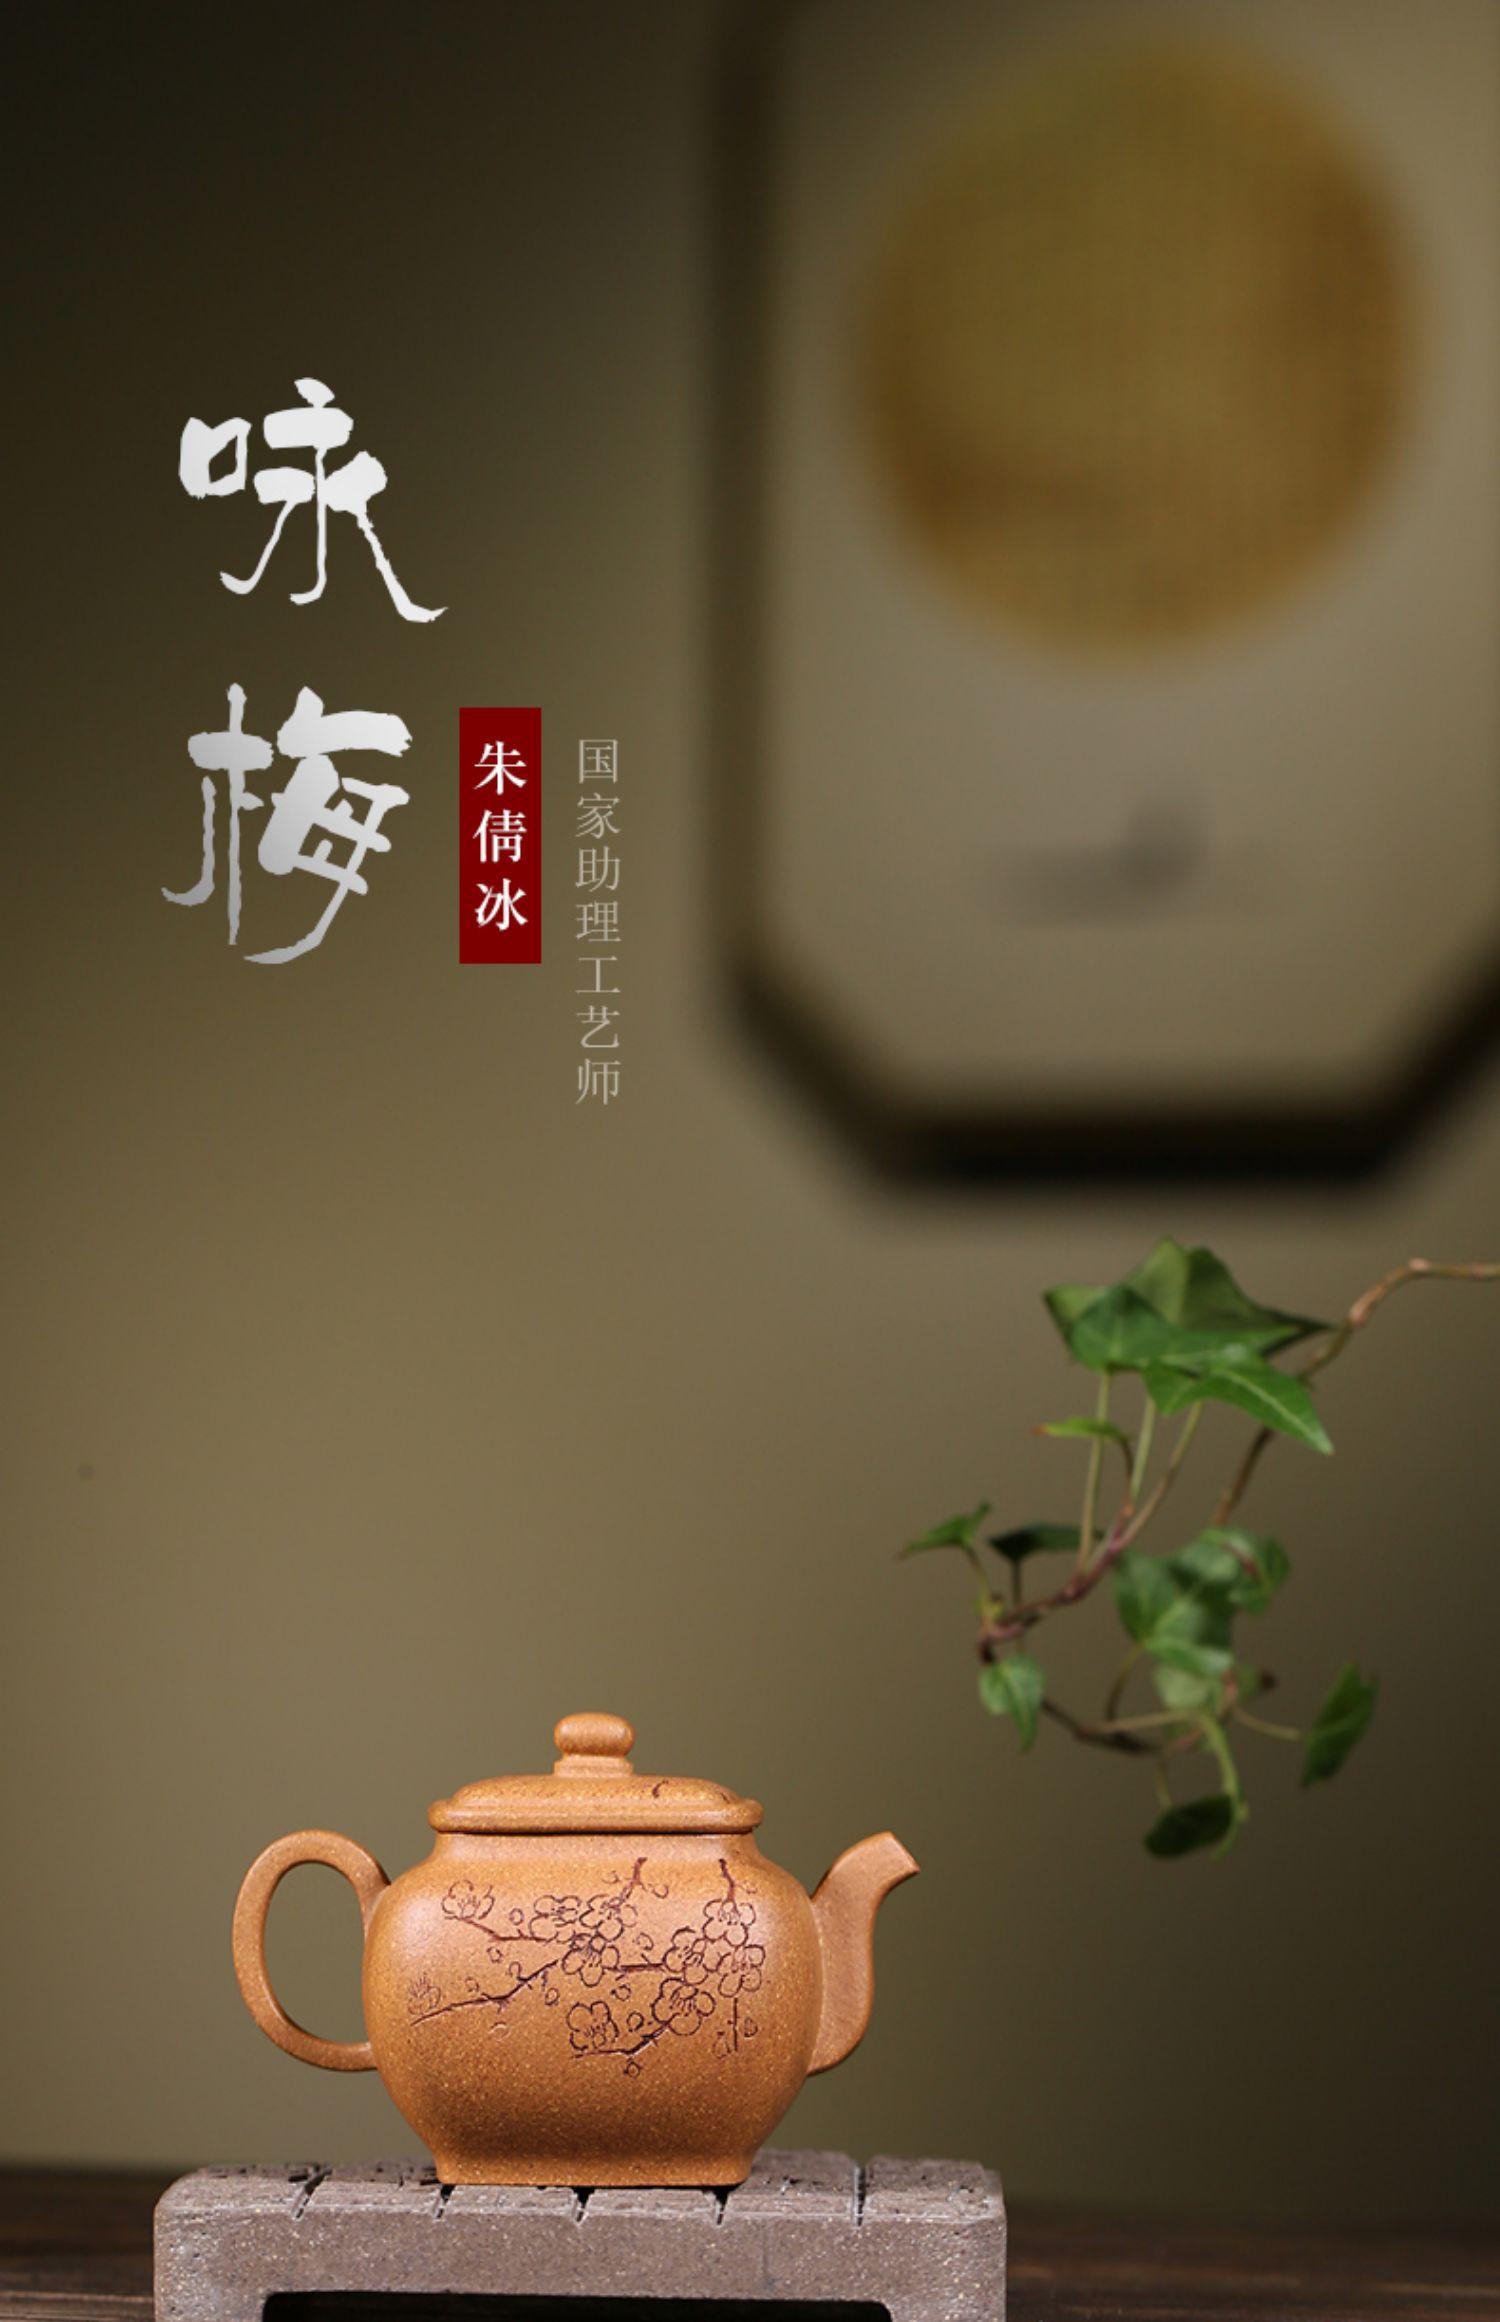 velha quadrado bule chá conjunto